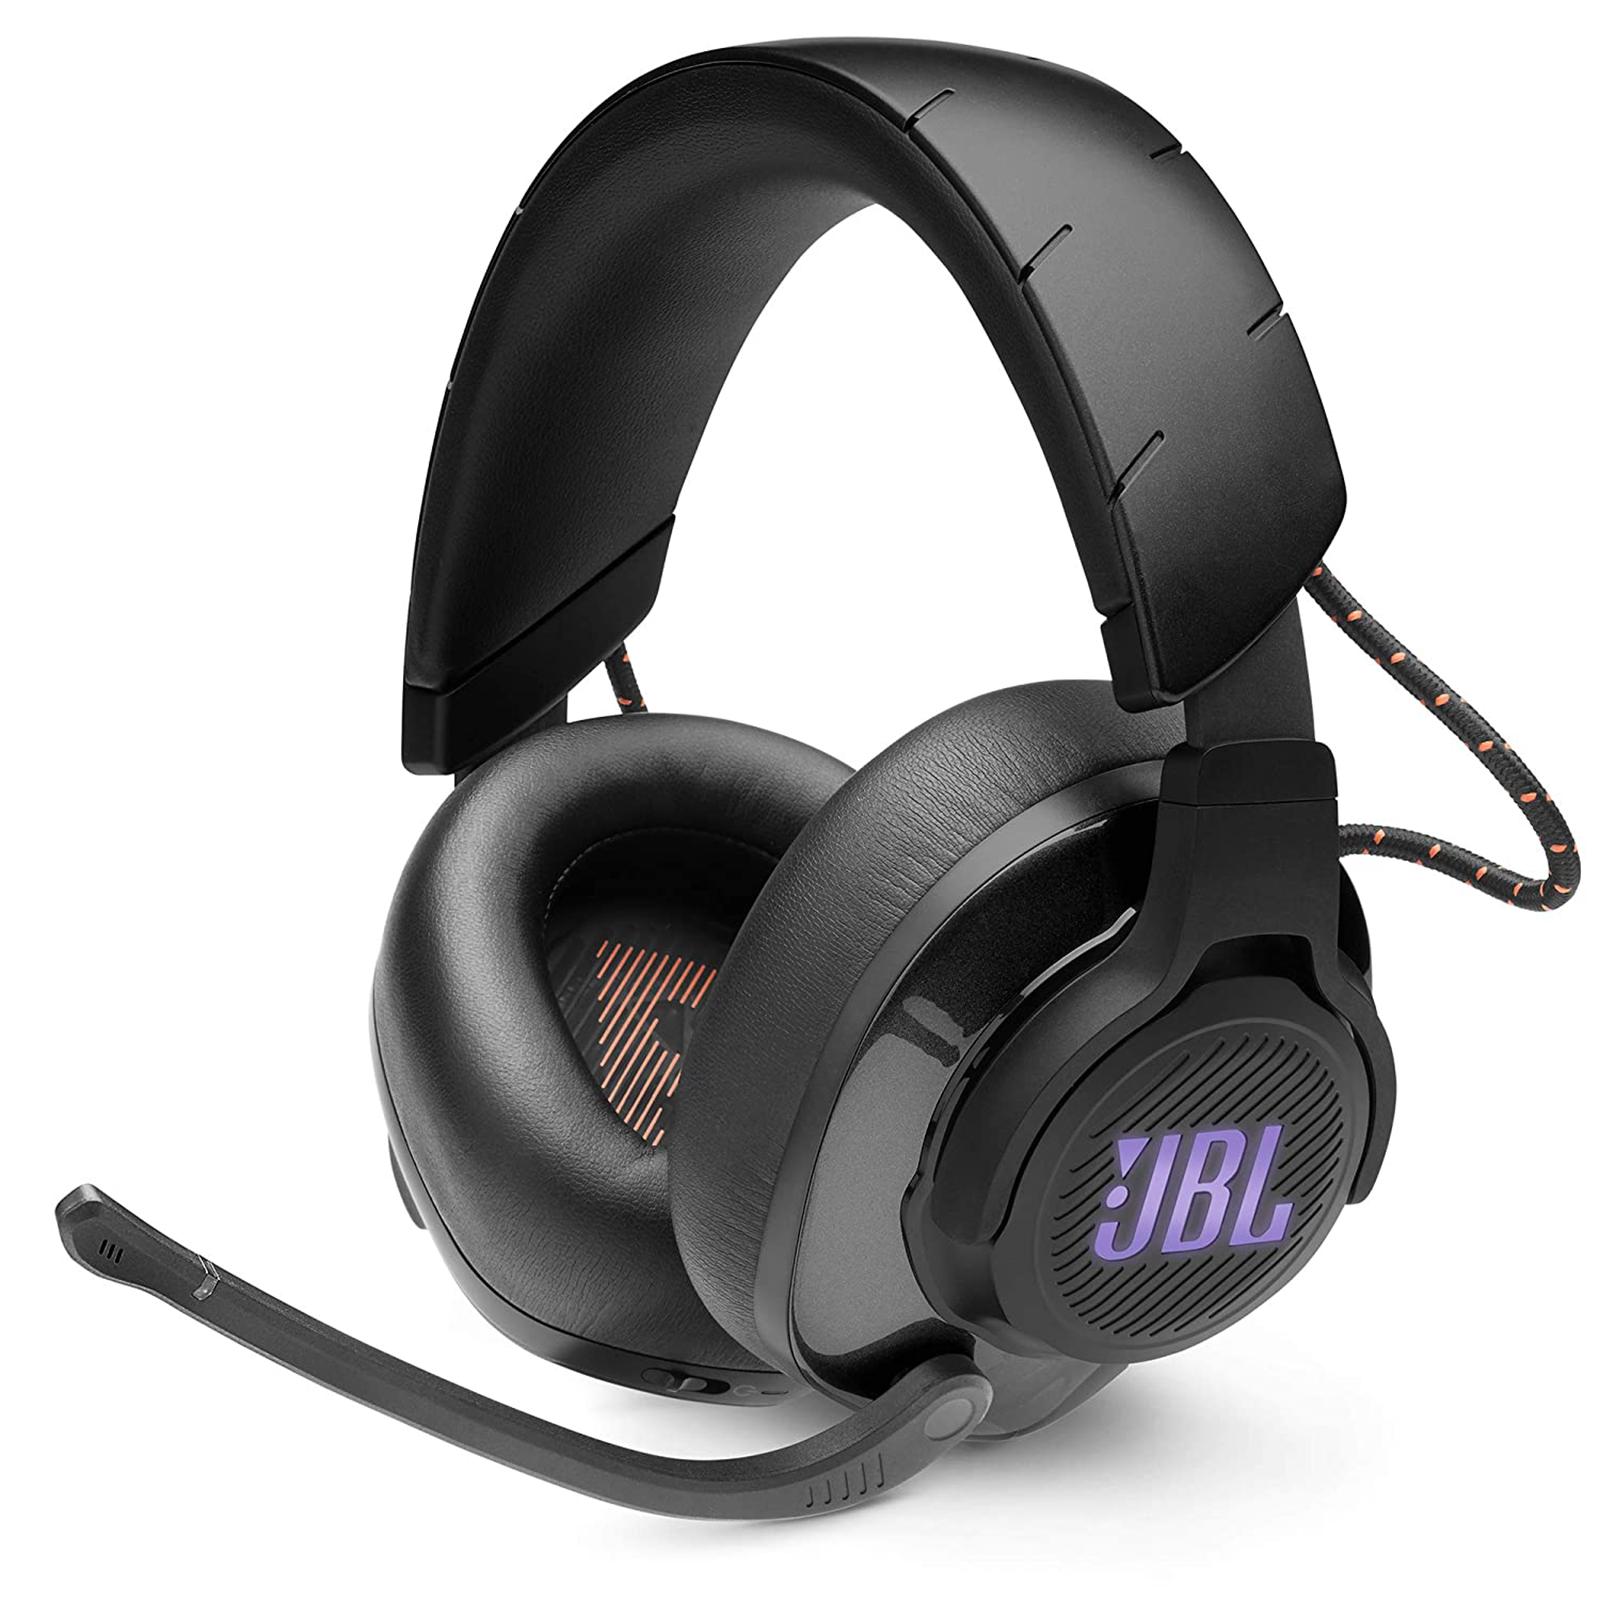 JBL Quantum 600 Over-Ear Wireless Gaming Headphone with Mic (JBLQUANTUM600BLK, Black)_1